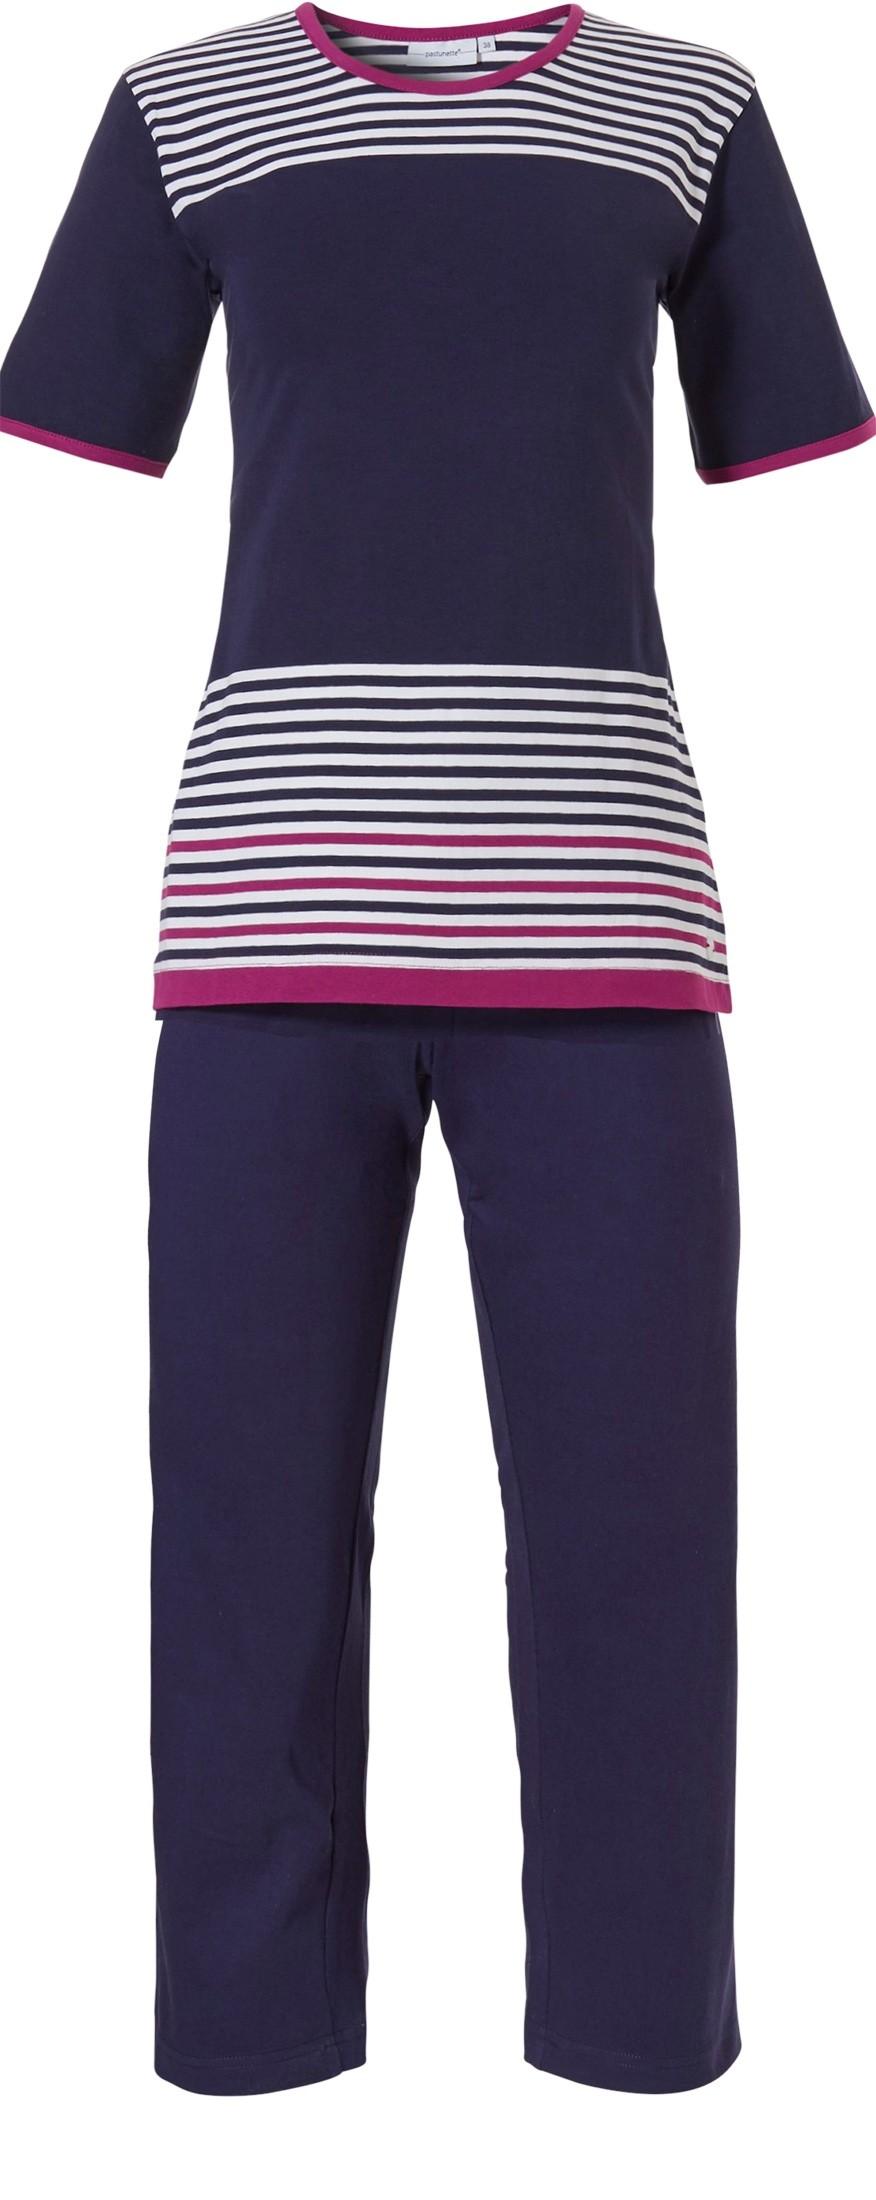 Dames pyjama Pastunette 20201-124-2-40